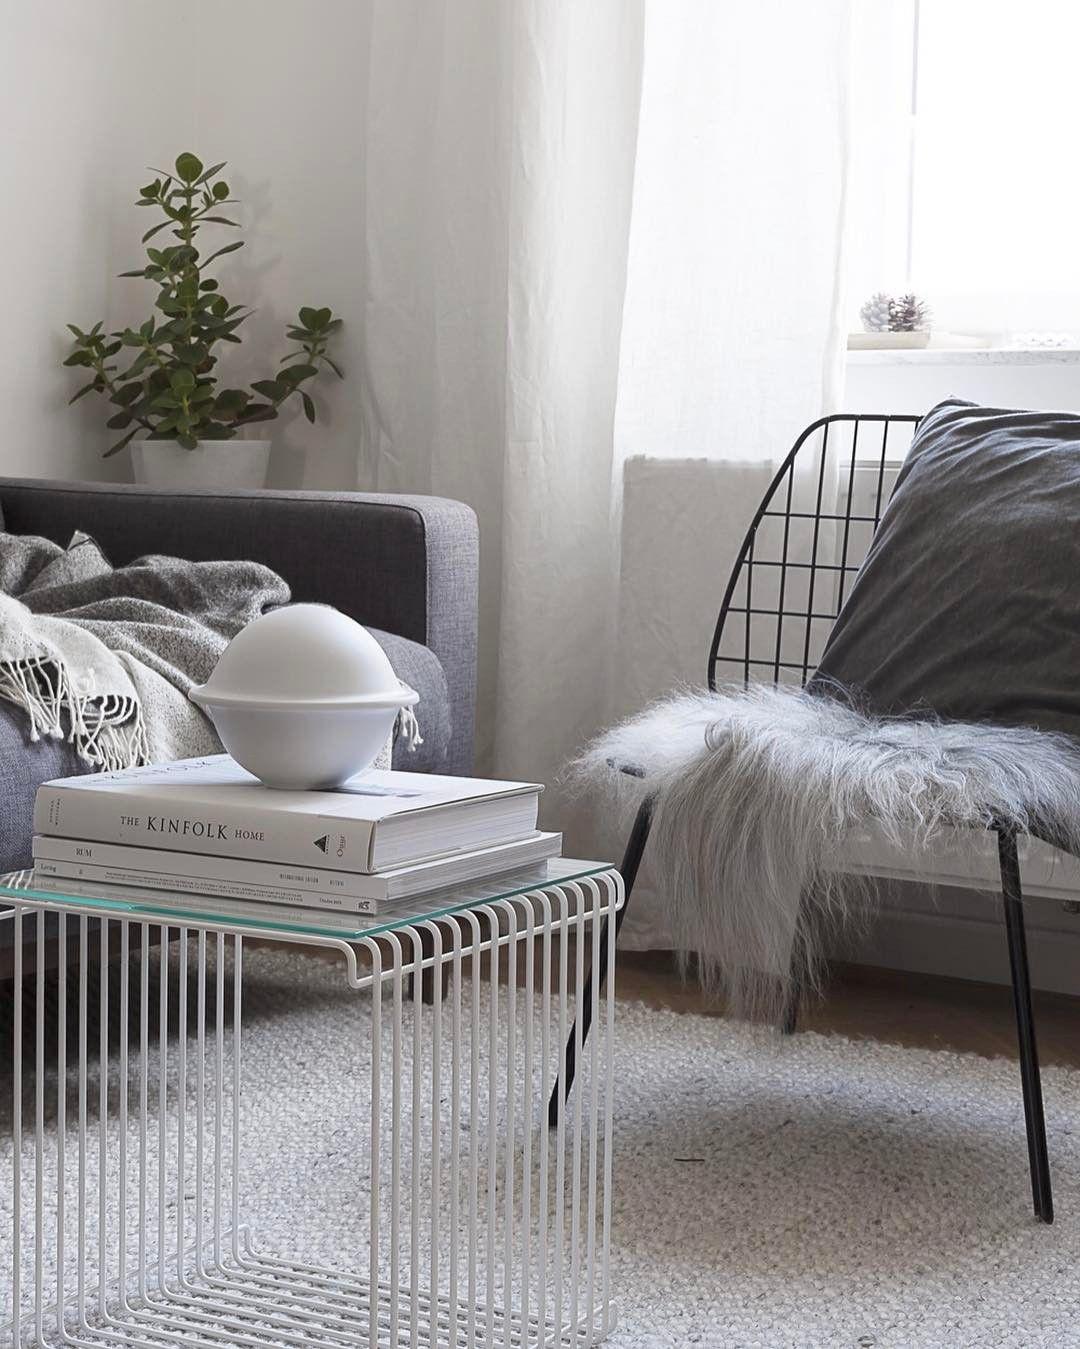 Sunday mornings are the best | residential interiors | Pinterest ...